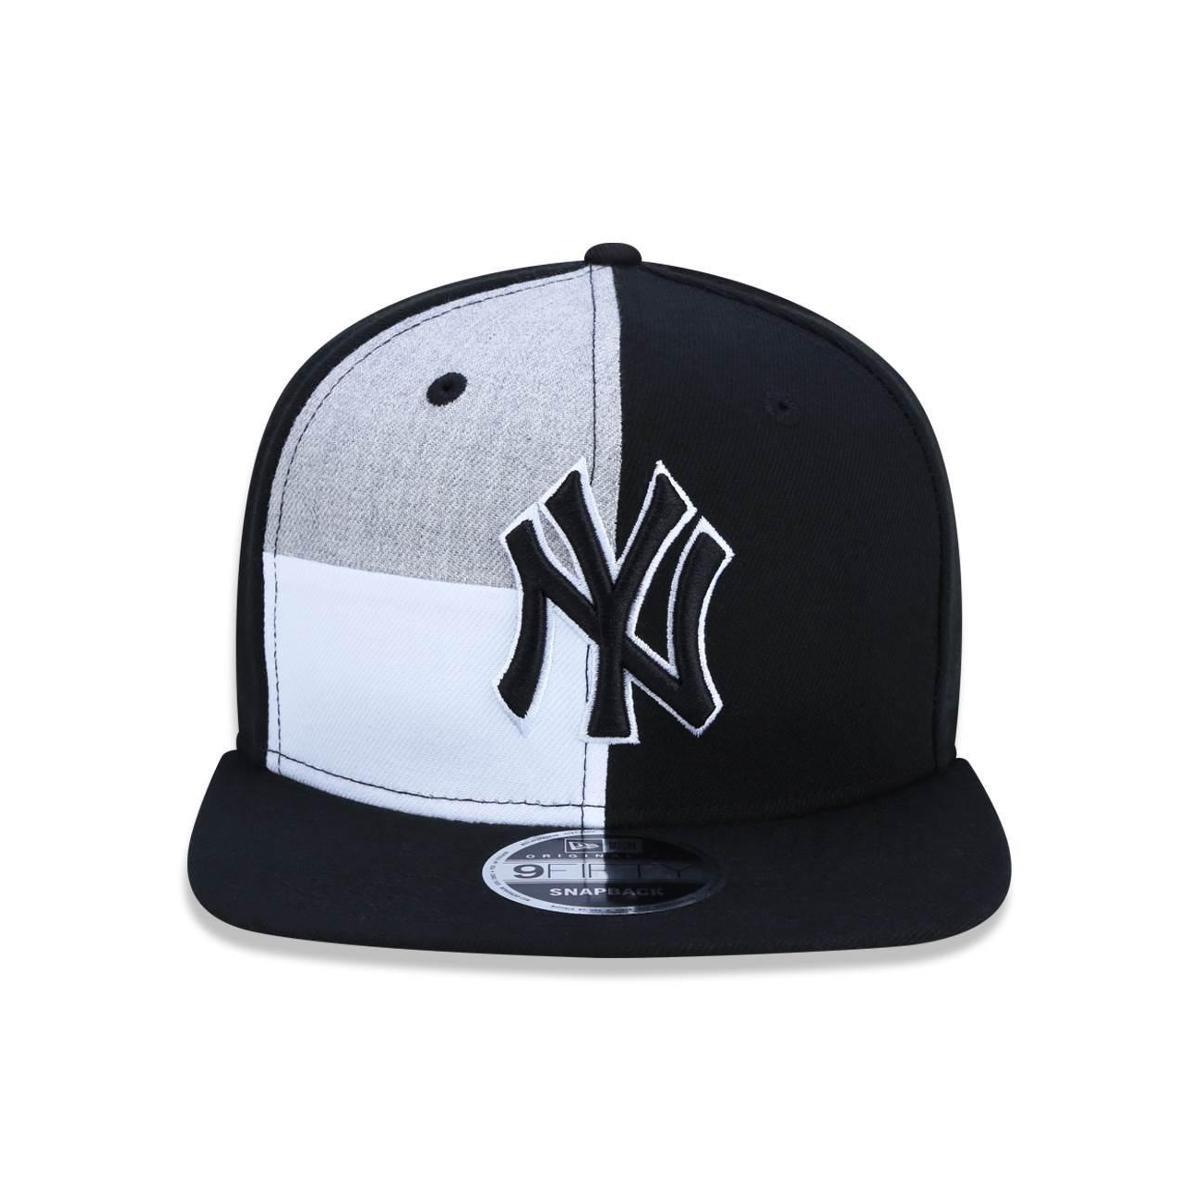 2e42f4f1d0 ... Bone 950 Original Fit New York Yankees MLB Aba Reta Snapback  Preto Cinza New Era ...